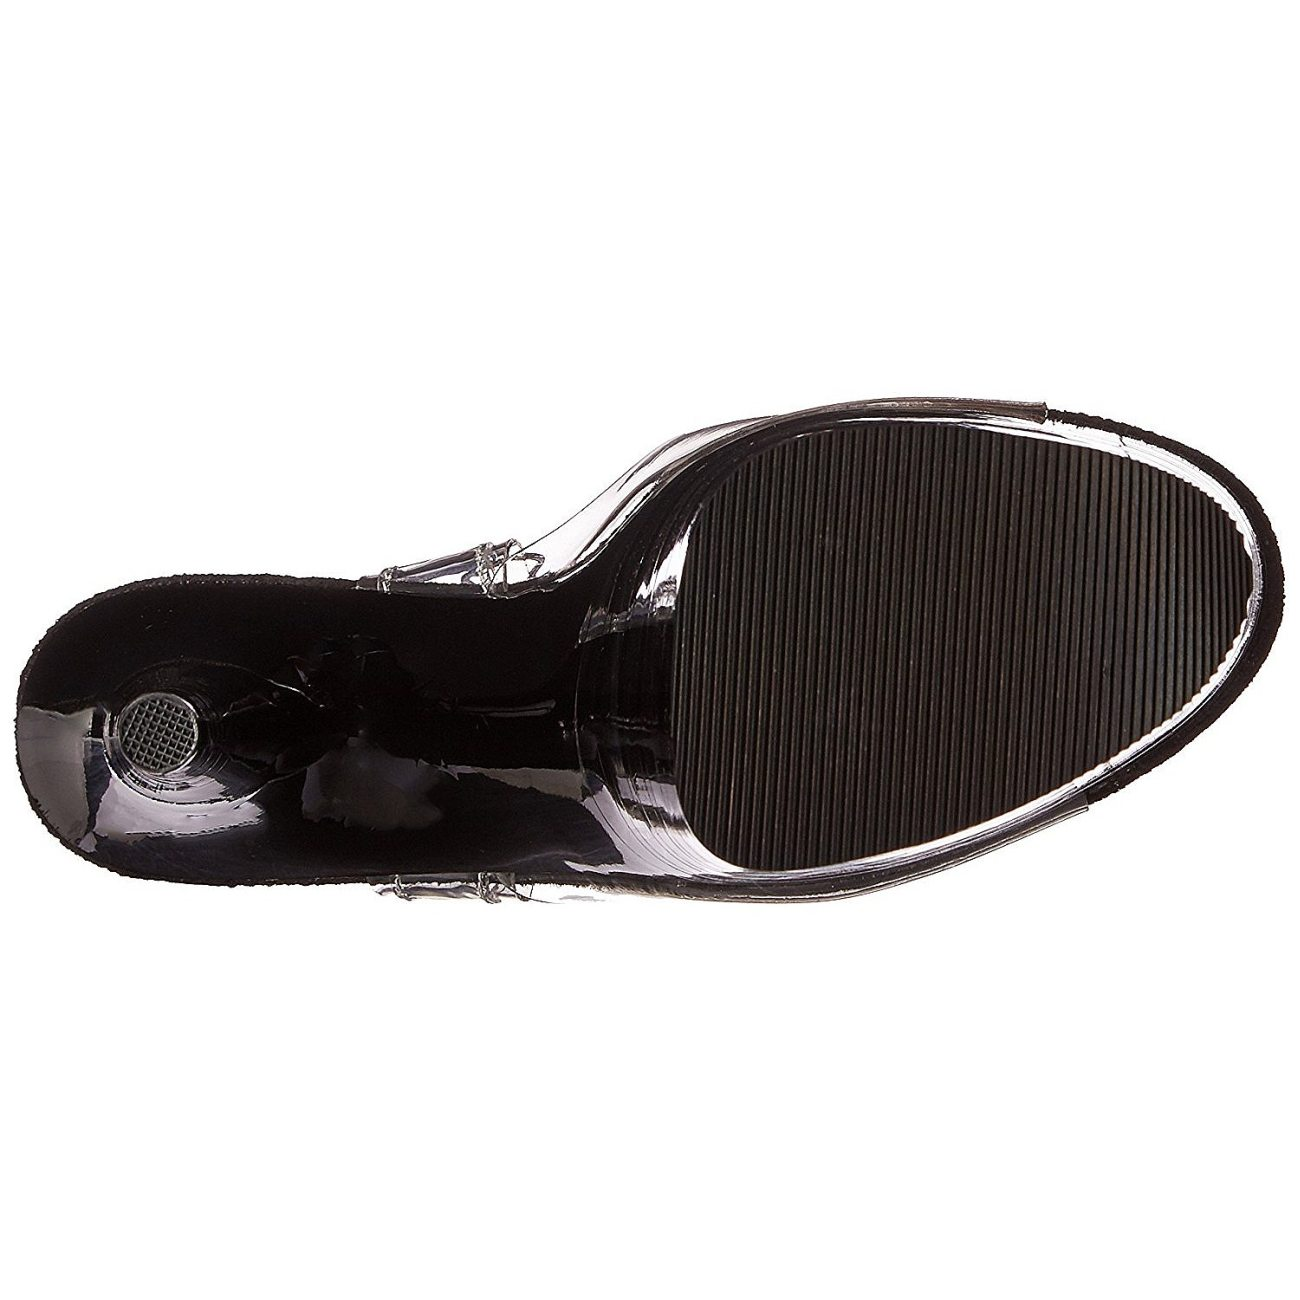 Transparent 20 cm FLAMINGO 808LN platå klackar skor